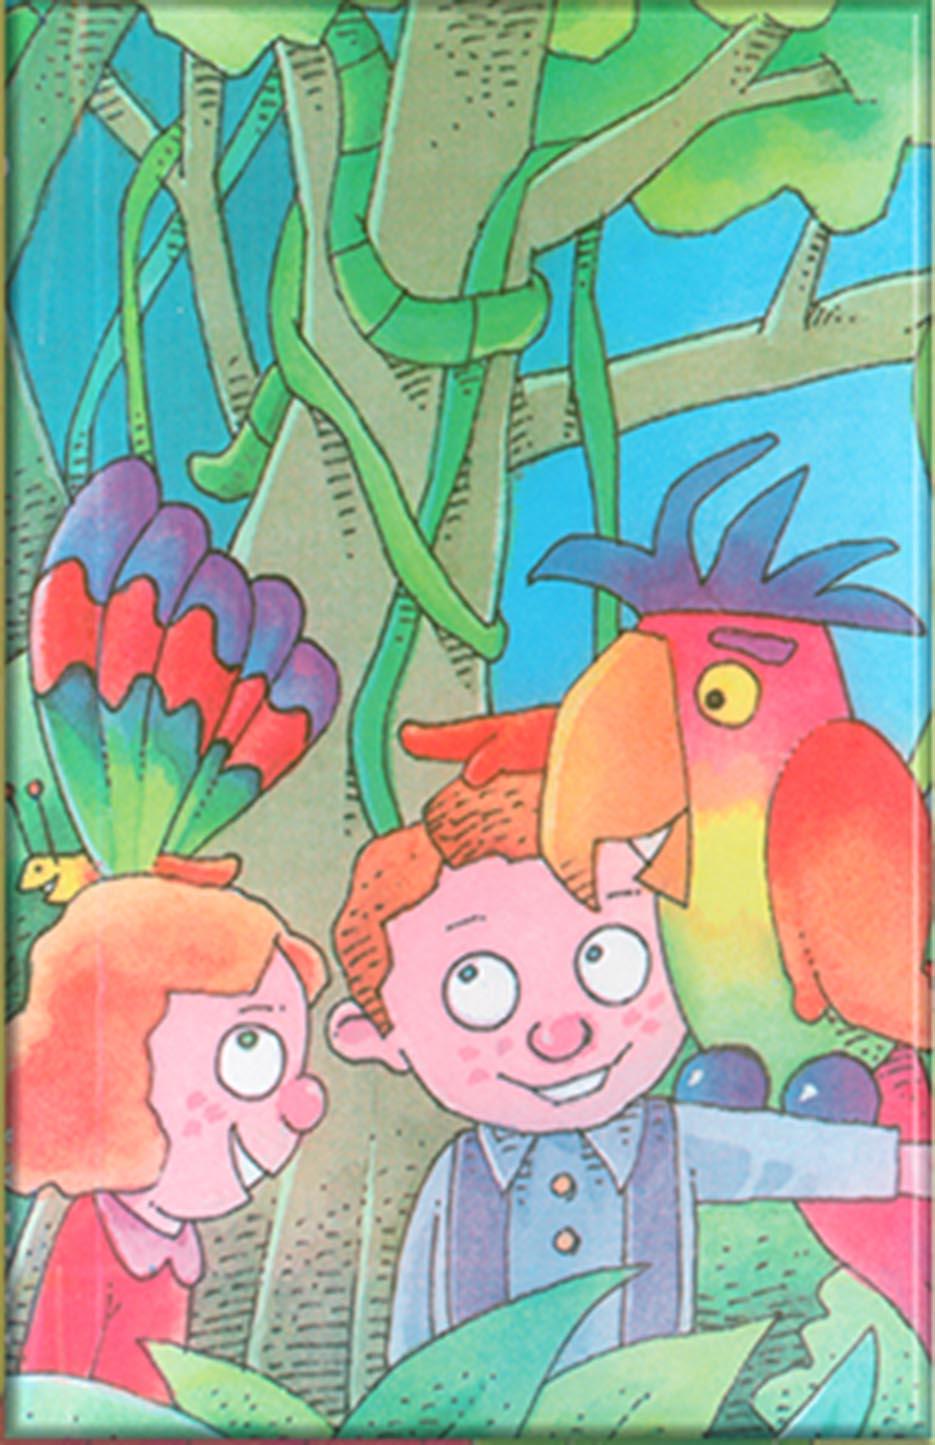 Albagreka – Personalizovane knjige